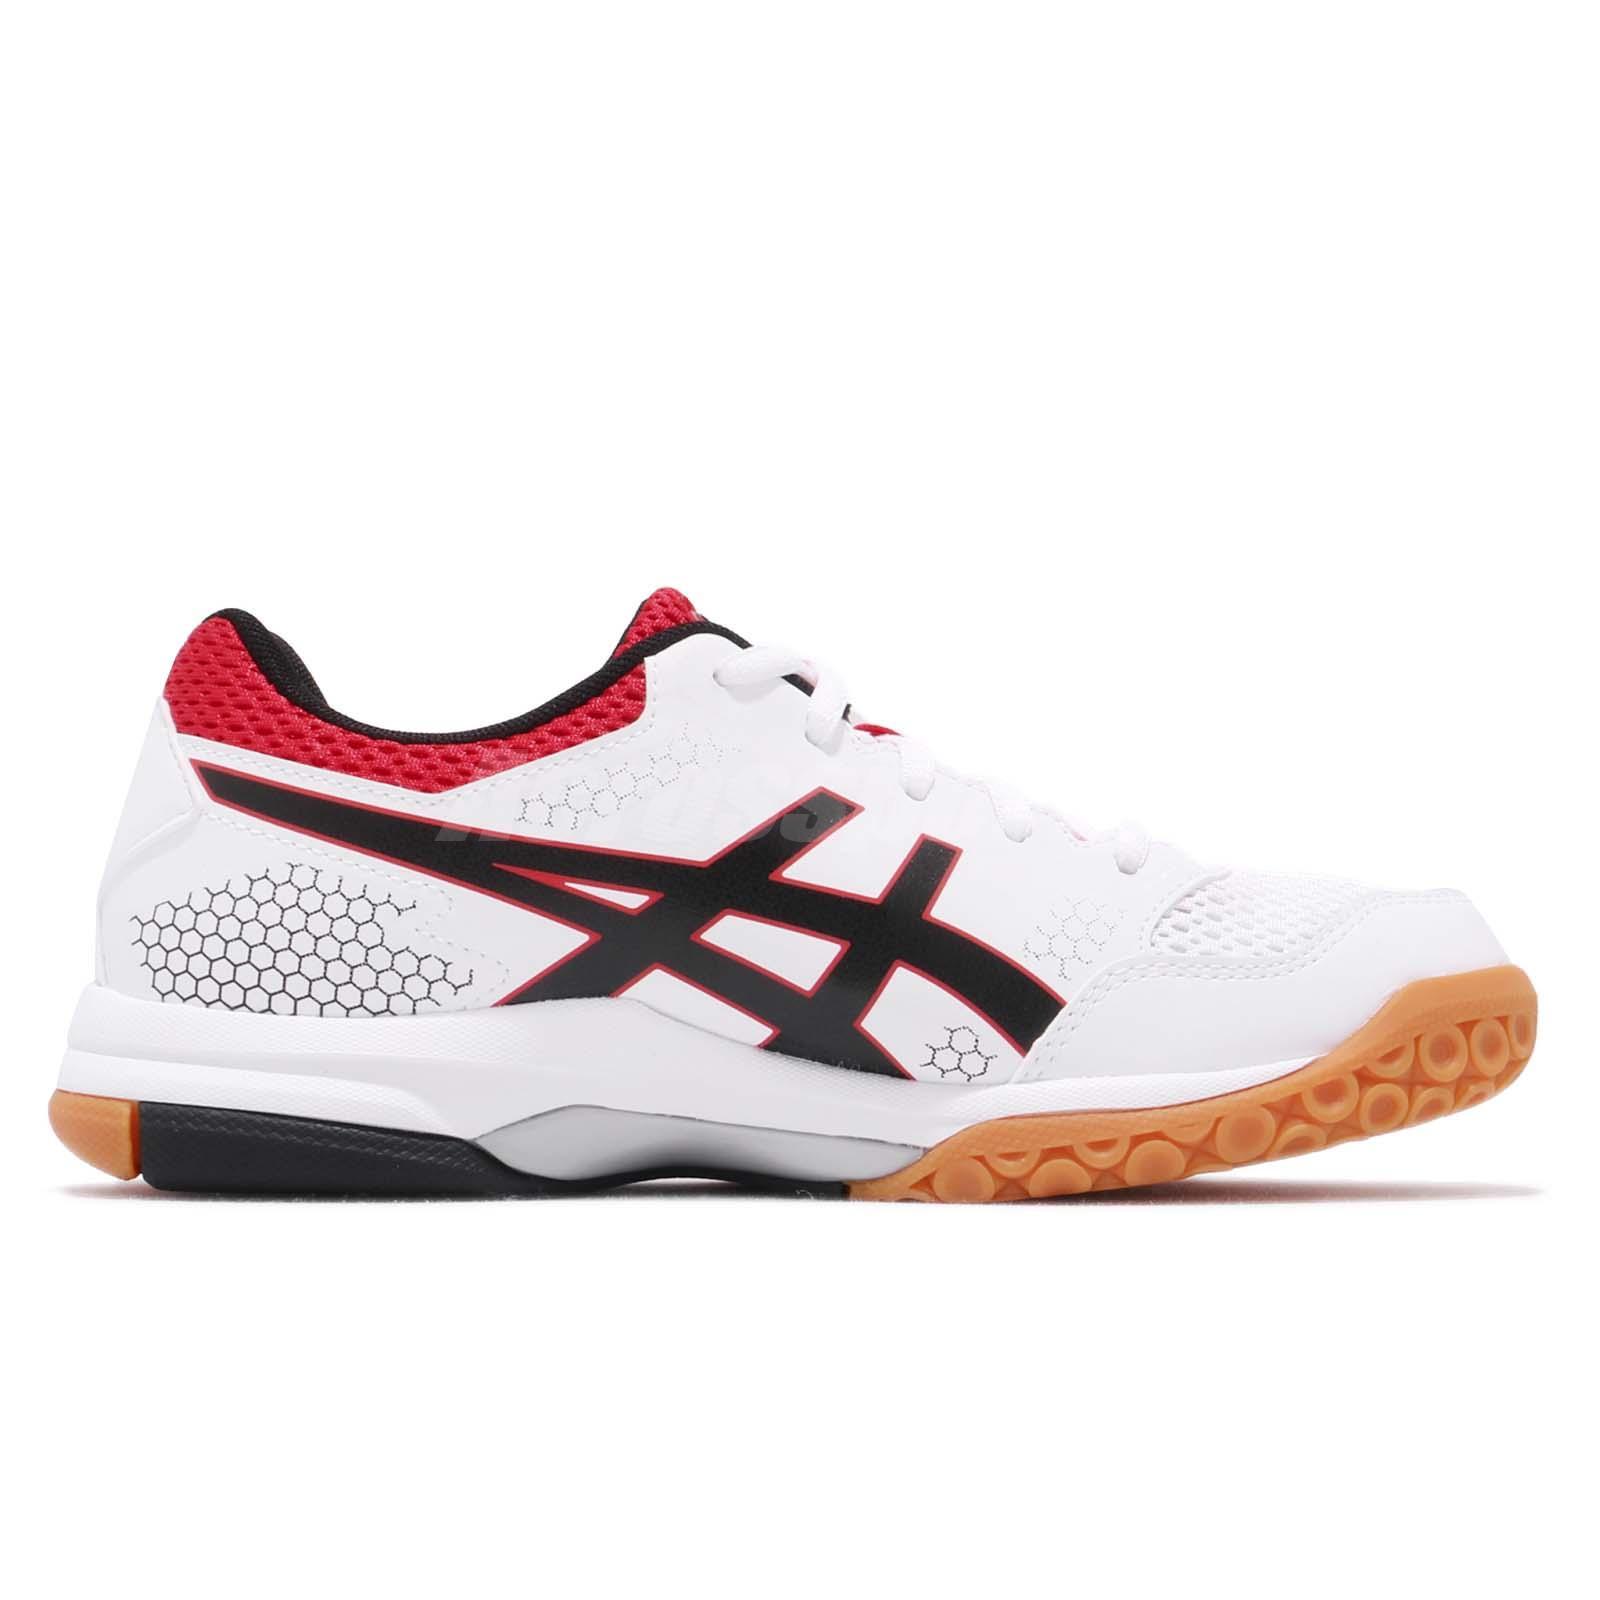 Asics gel rocket squash chaussures pointure 8